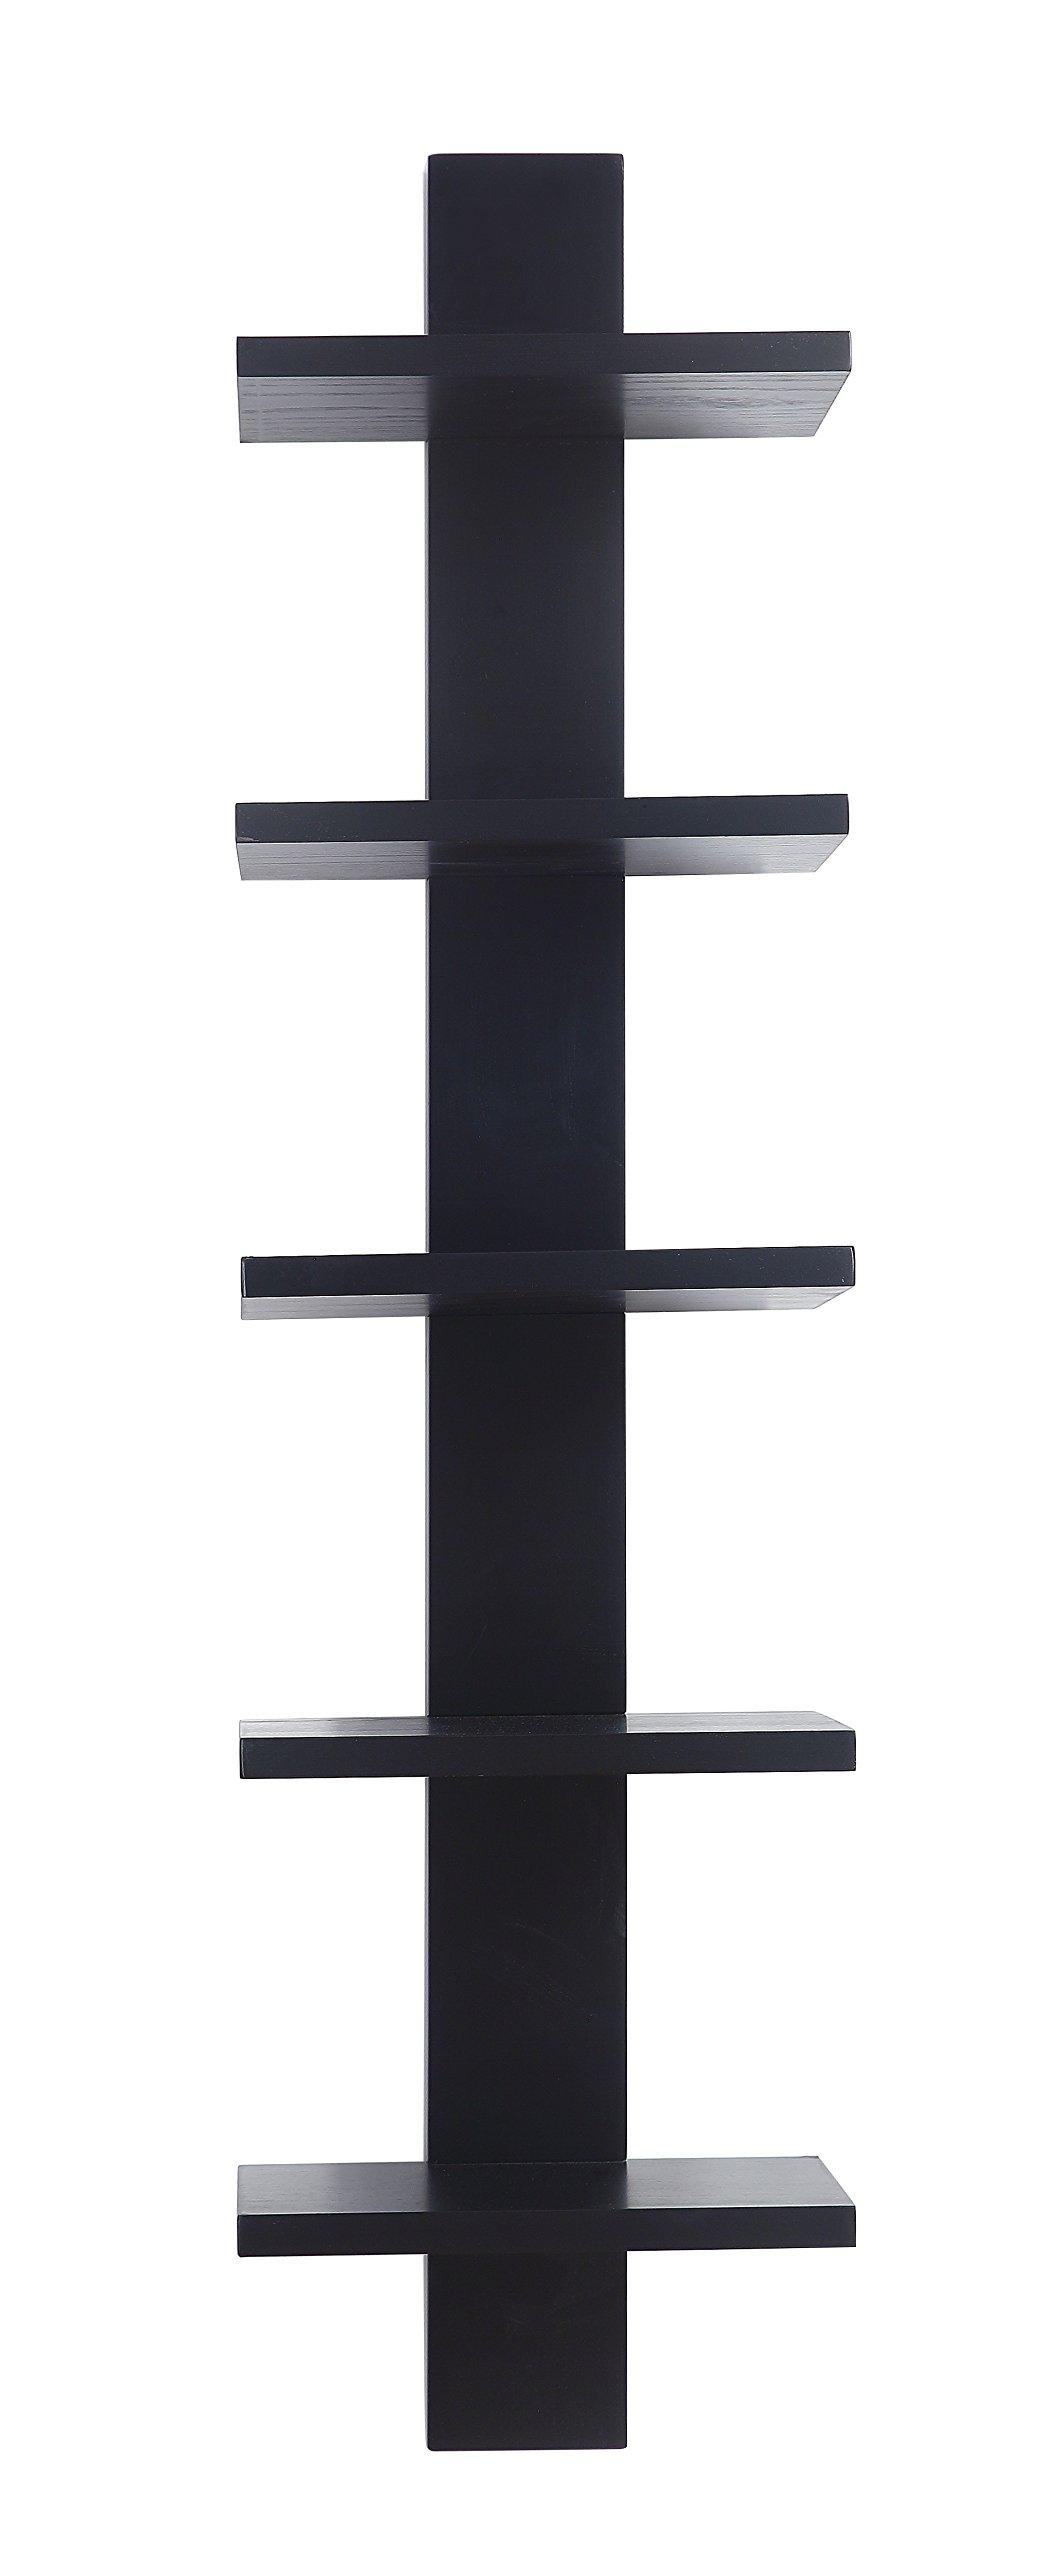 Proman Products WM16565 Spine Book Shelf